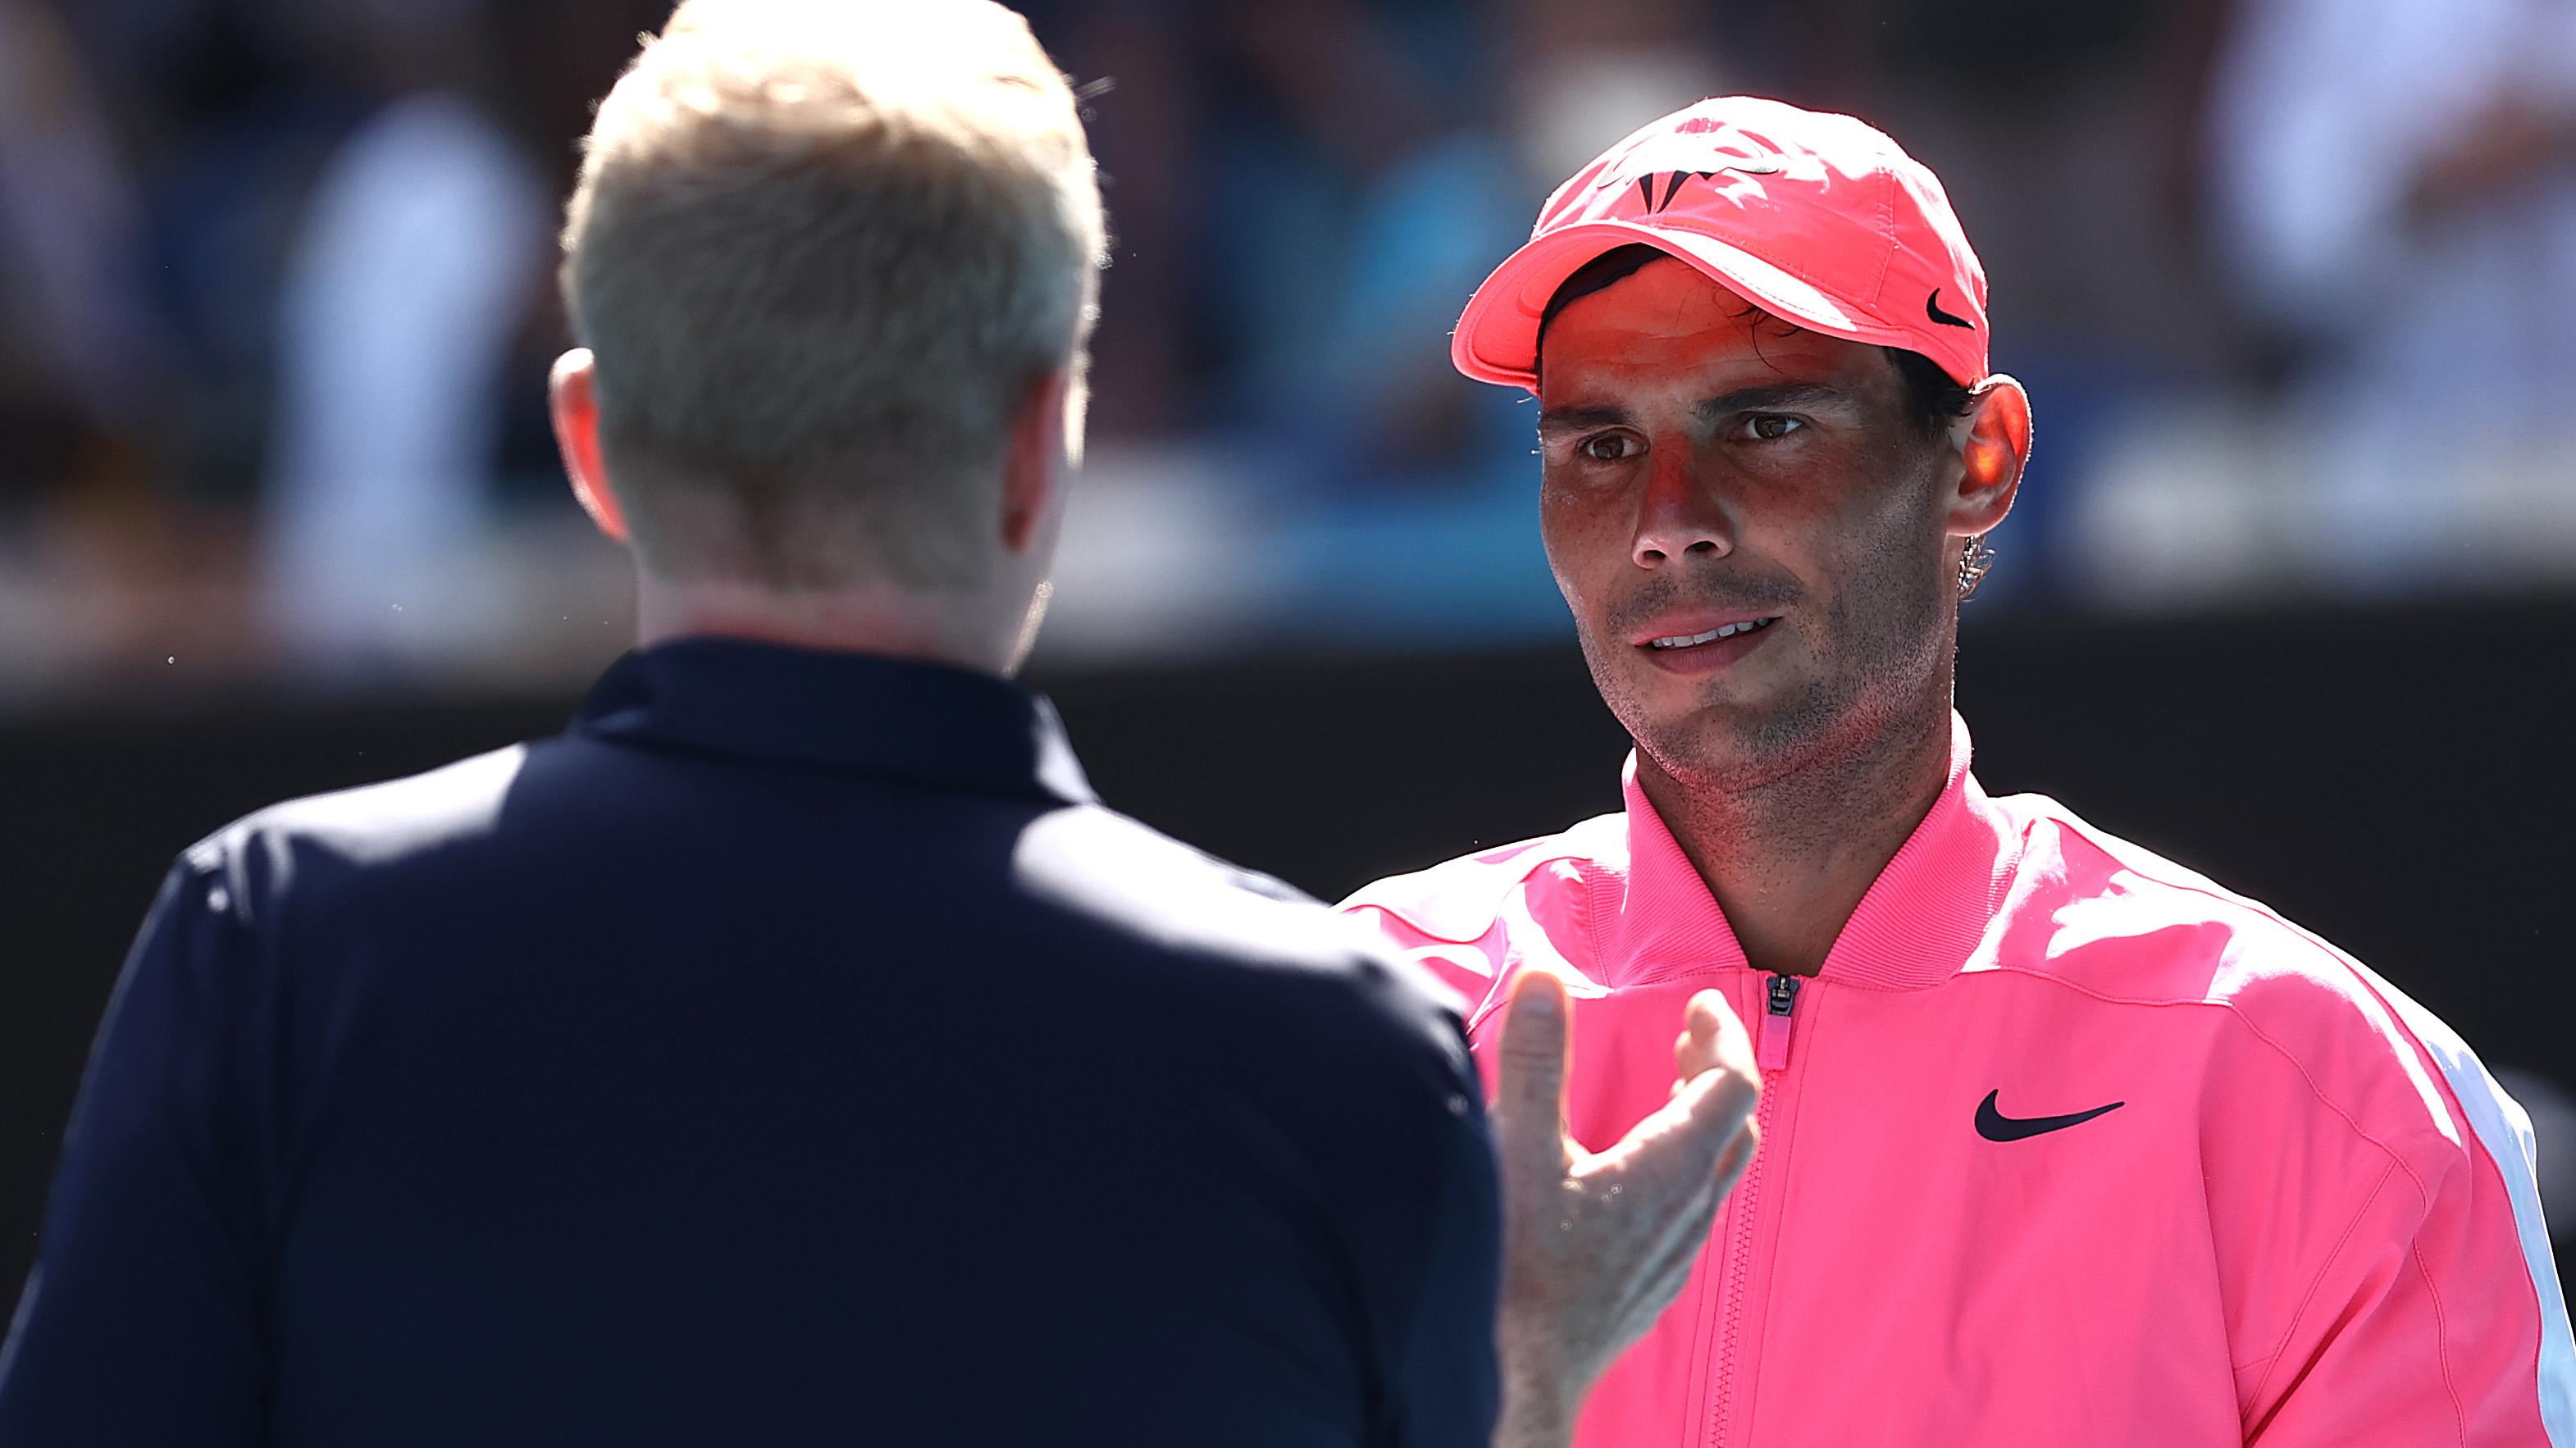 Rafael Nadal Jim Courier Interview Australian Open First Round